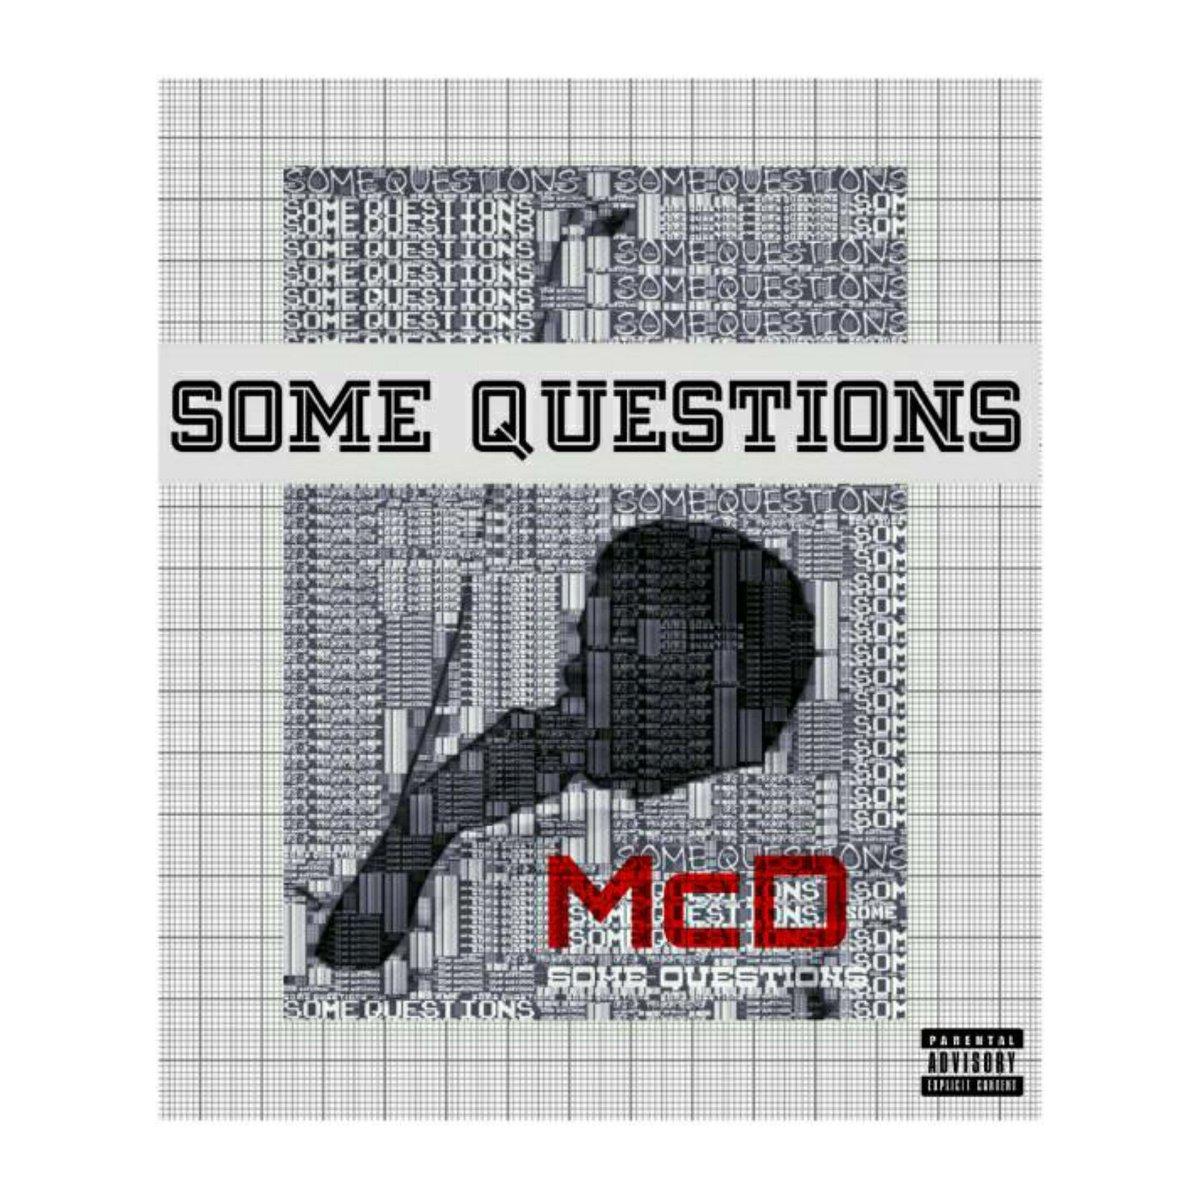 Some Questions by McD #np on #SoundCloud  https:// soundcloud.com/mcdaniel-danju ma/some-questions &nbsp; … <br>http://pic.twitter.com/bmxr0R4djn